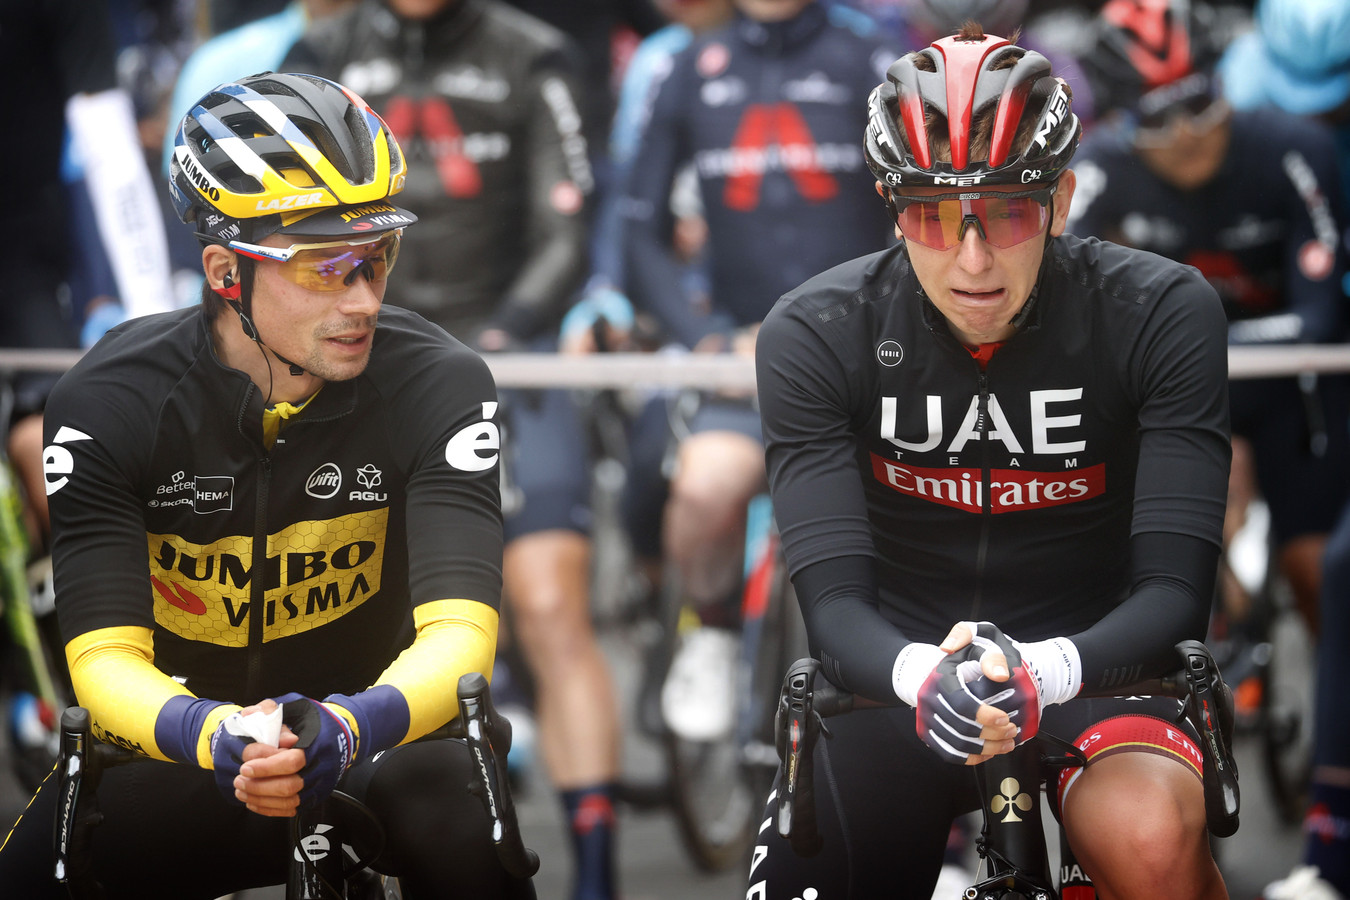 Primoz Roglic en Tadej Pogacar voor de etappe van vandaag.